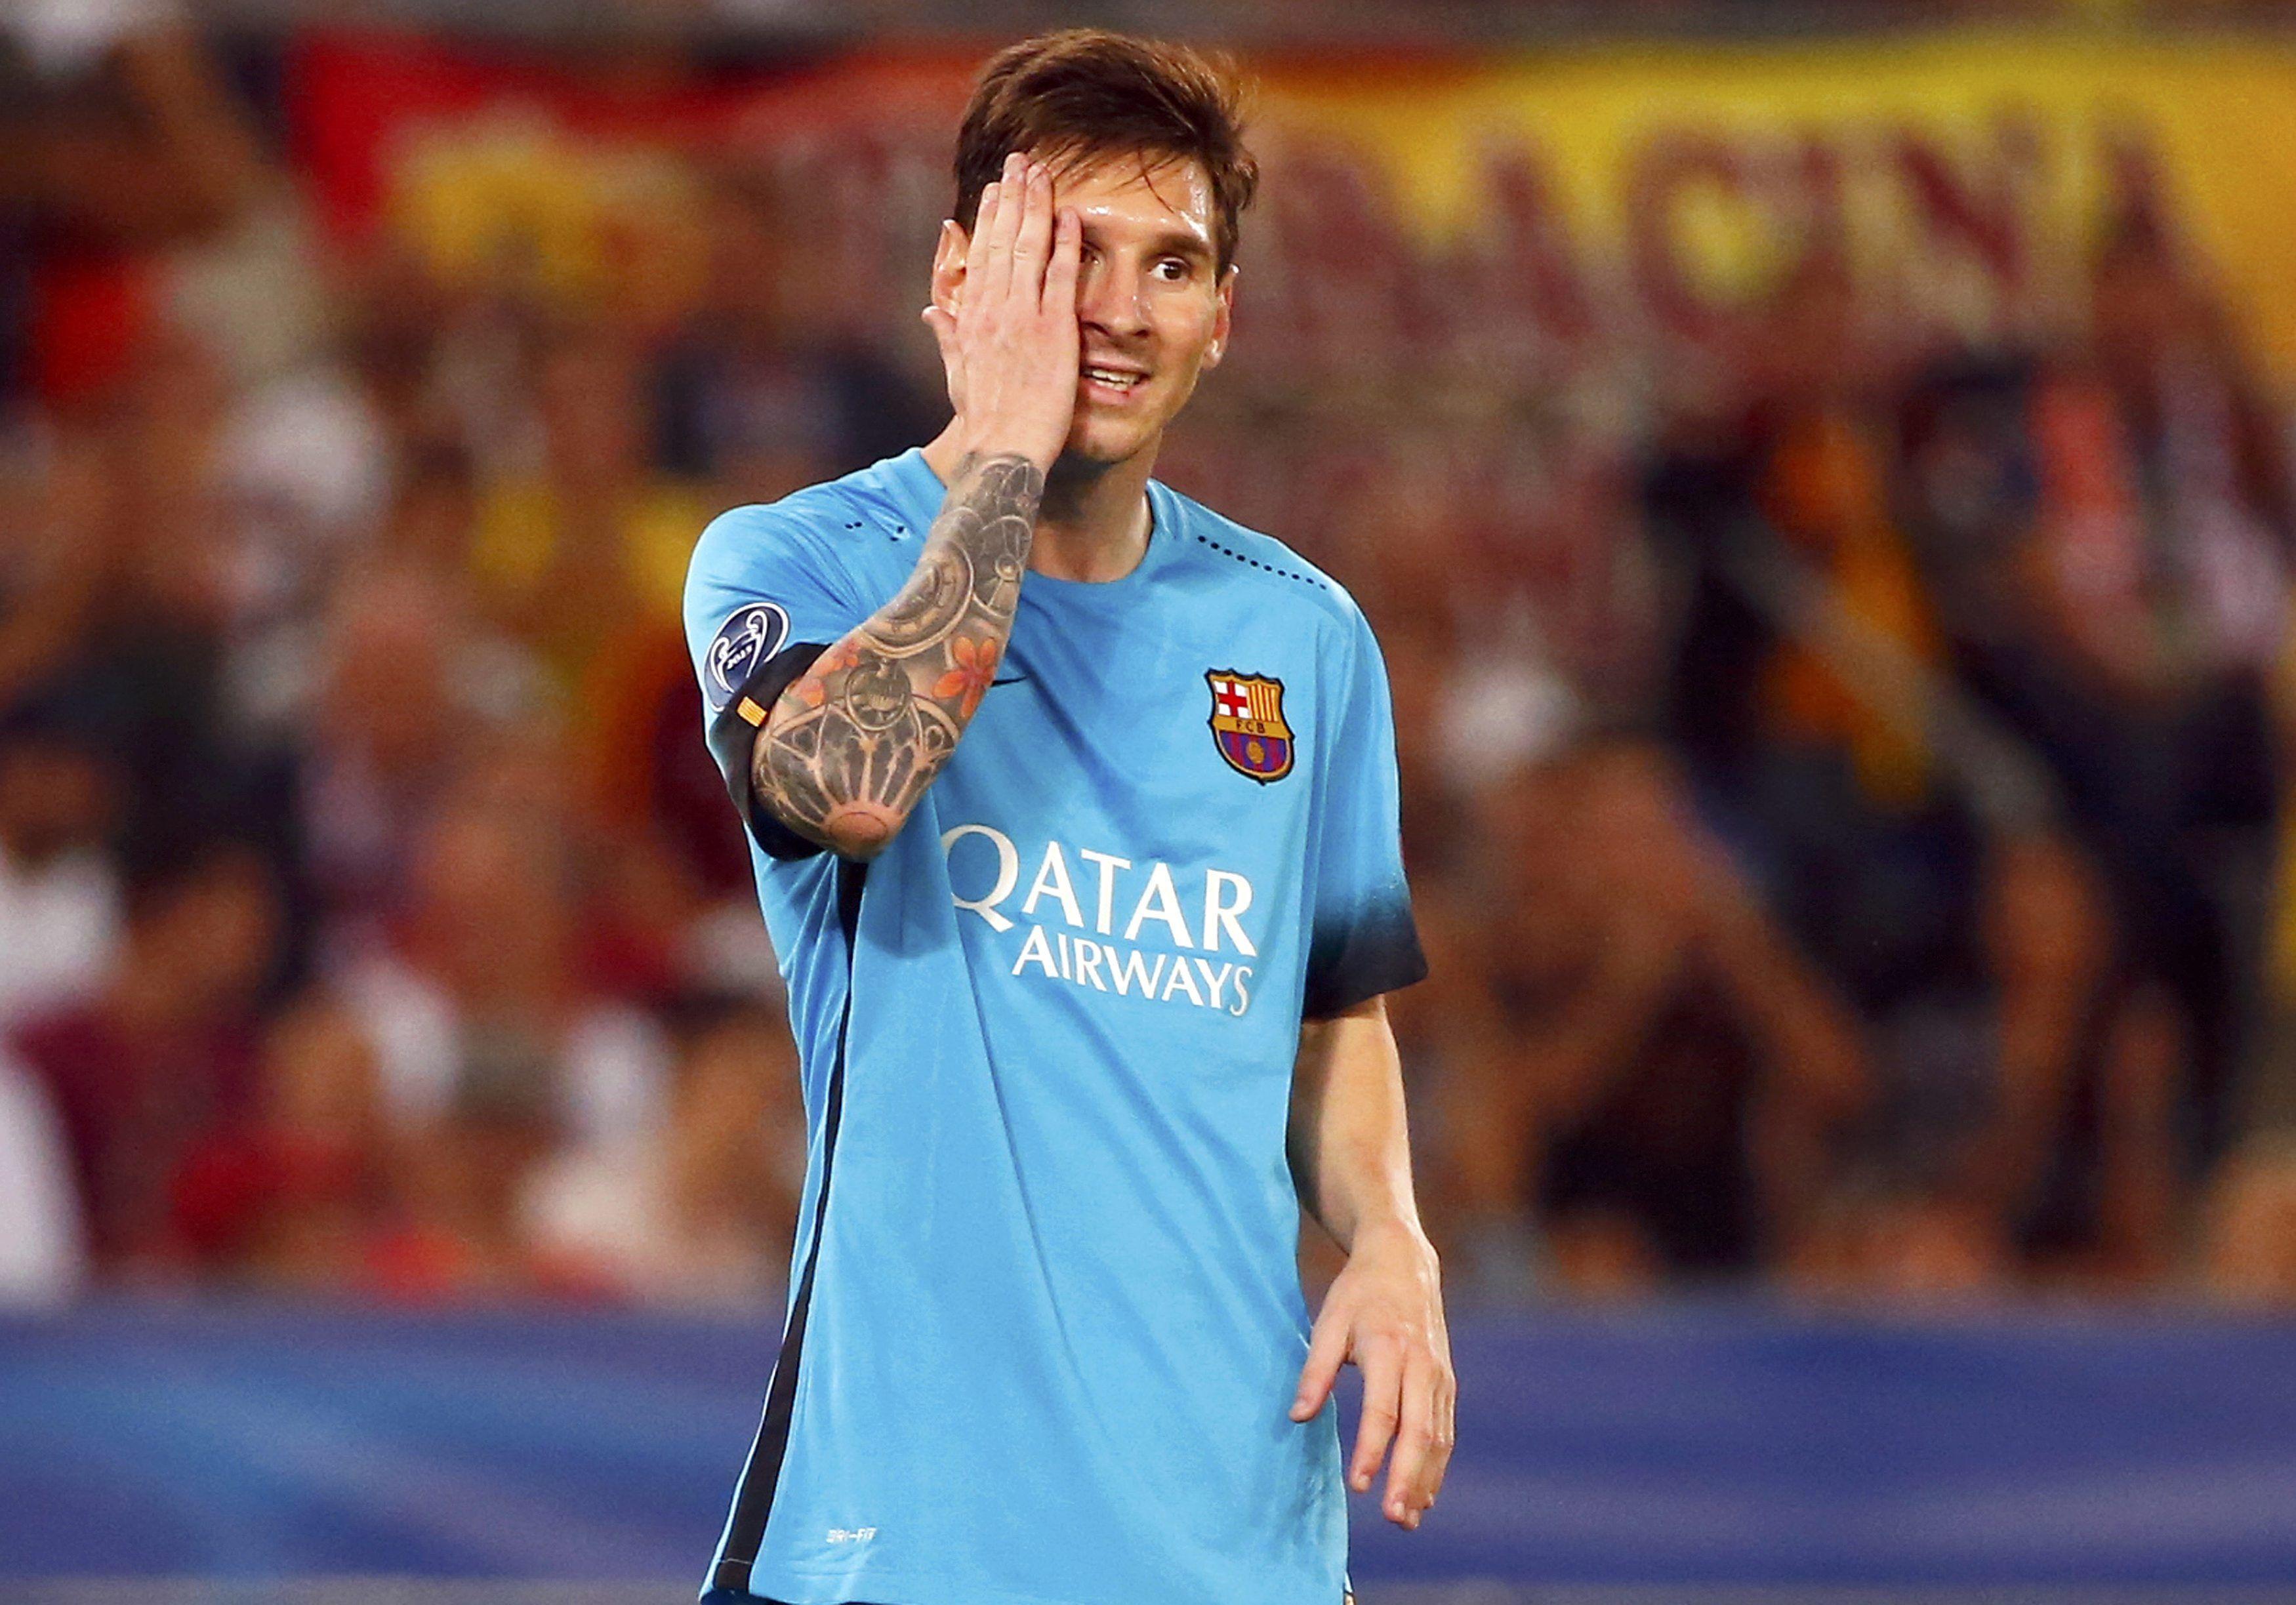 Messi 2017 Wallpapers - Wallpaper Cave